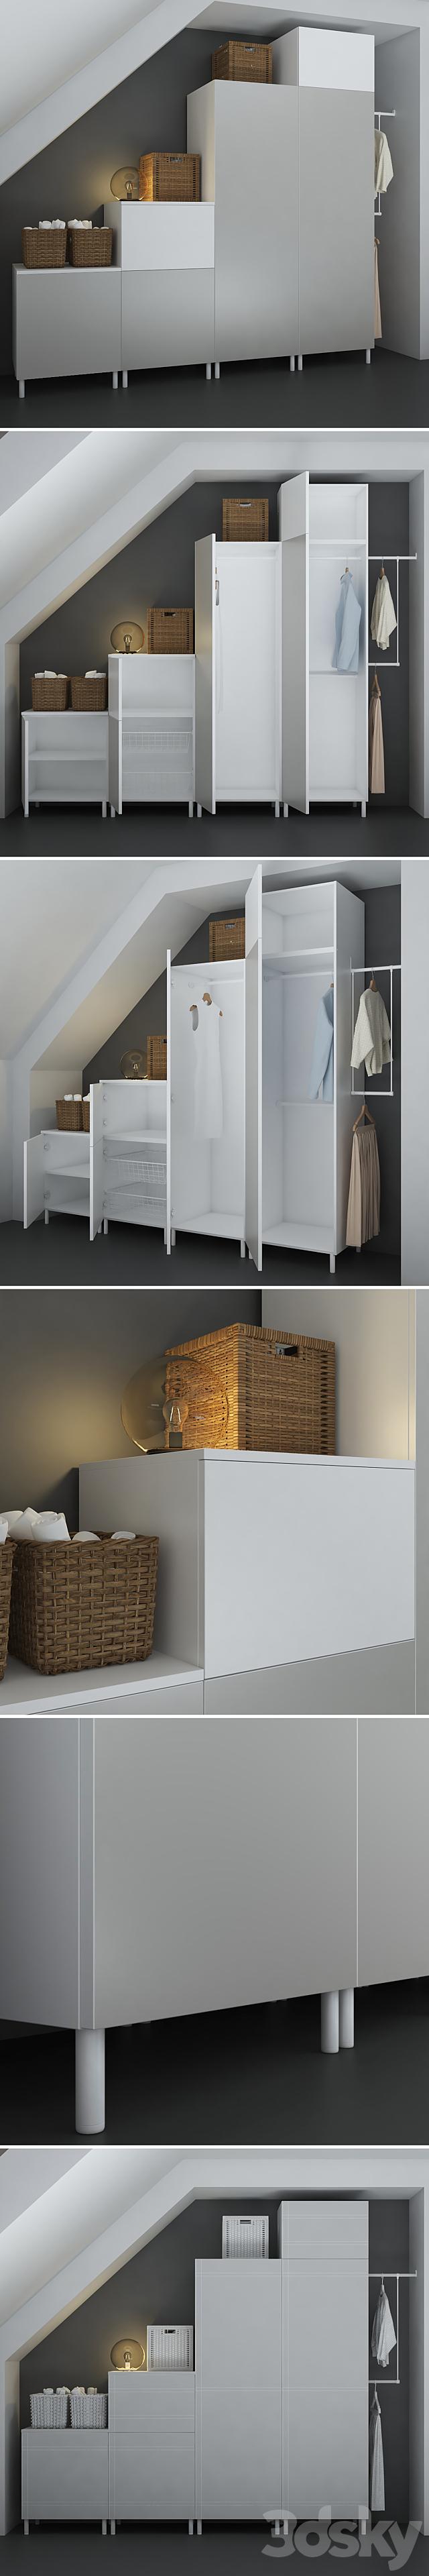 The combination of Ikea (Platsa) (designer).